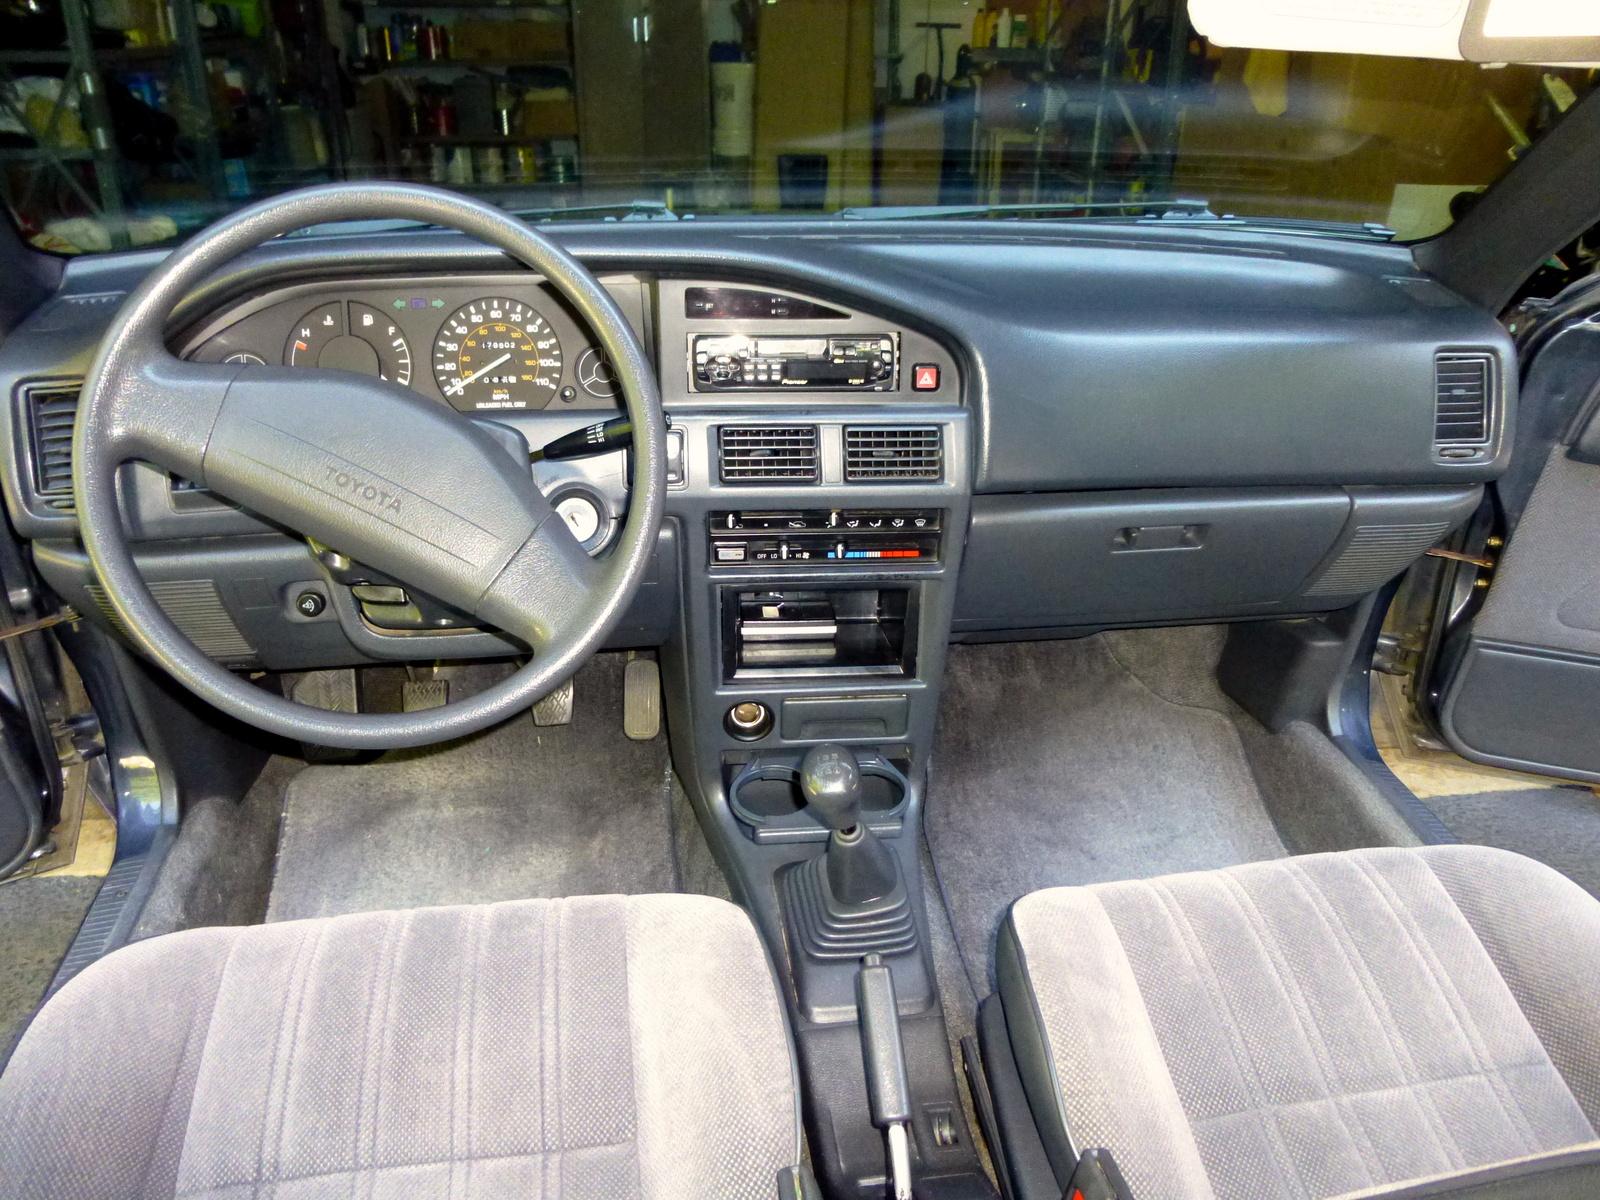 1991 toyota corolla interior pictures cargurus 2017 Honda Accord Honda Accord Sport